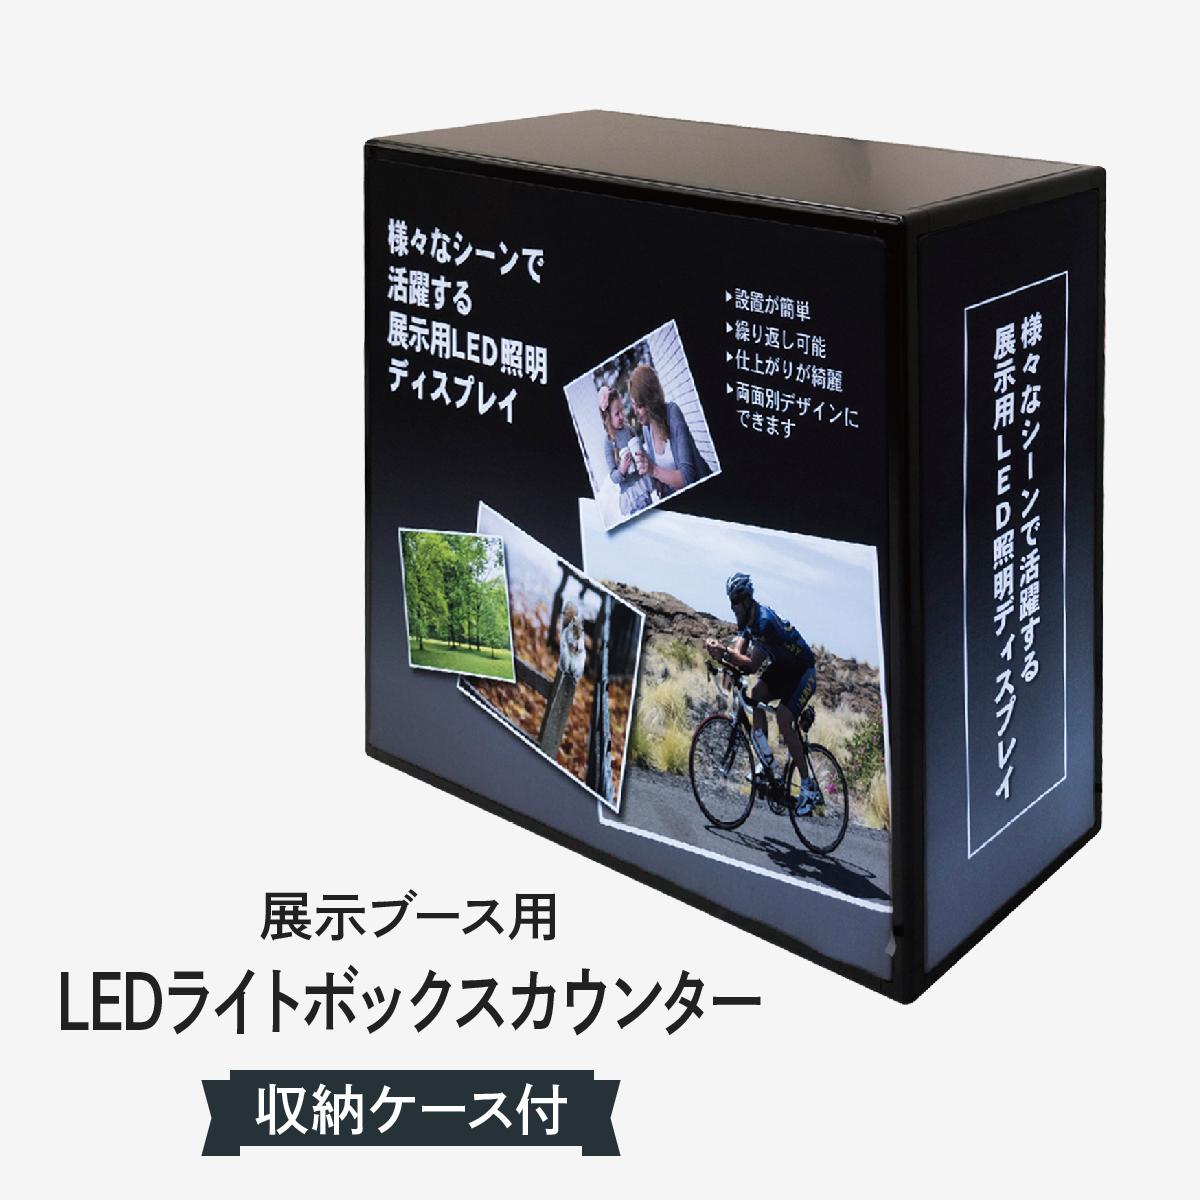 ledライトボックスカウンター